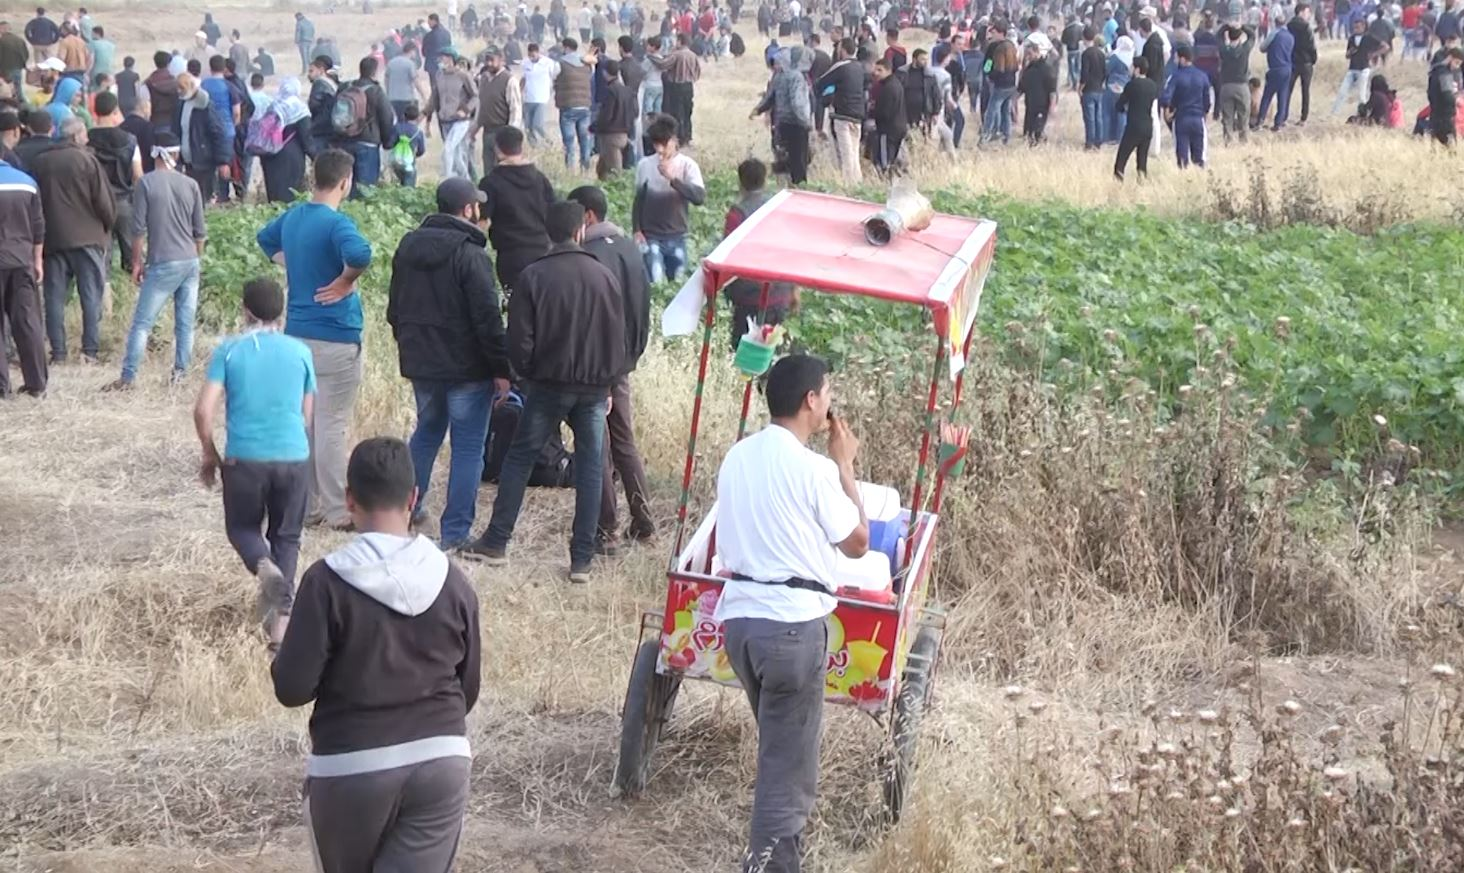 A vendor at Gaza's Great Return March